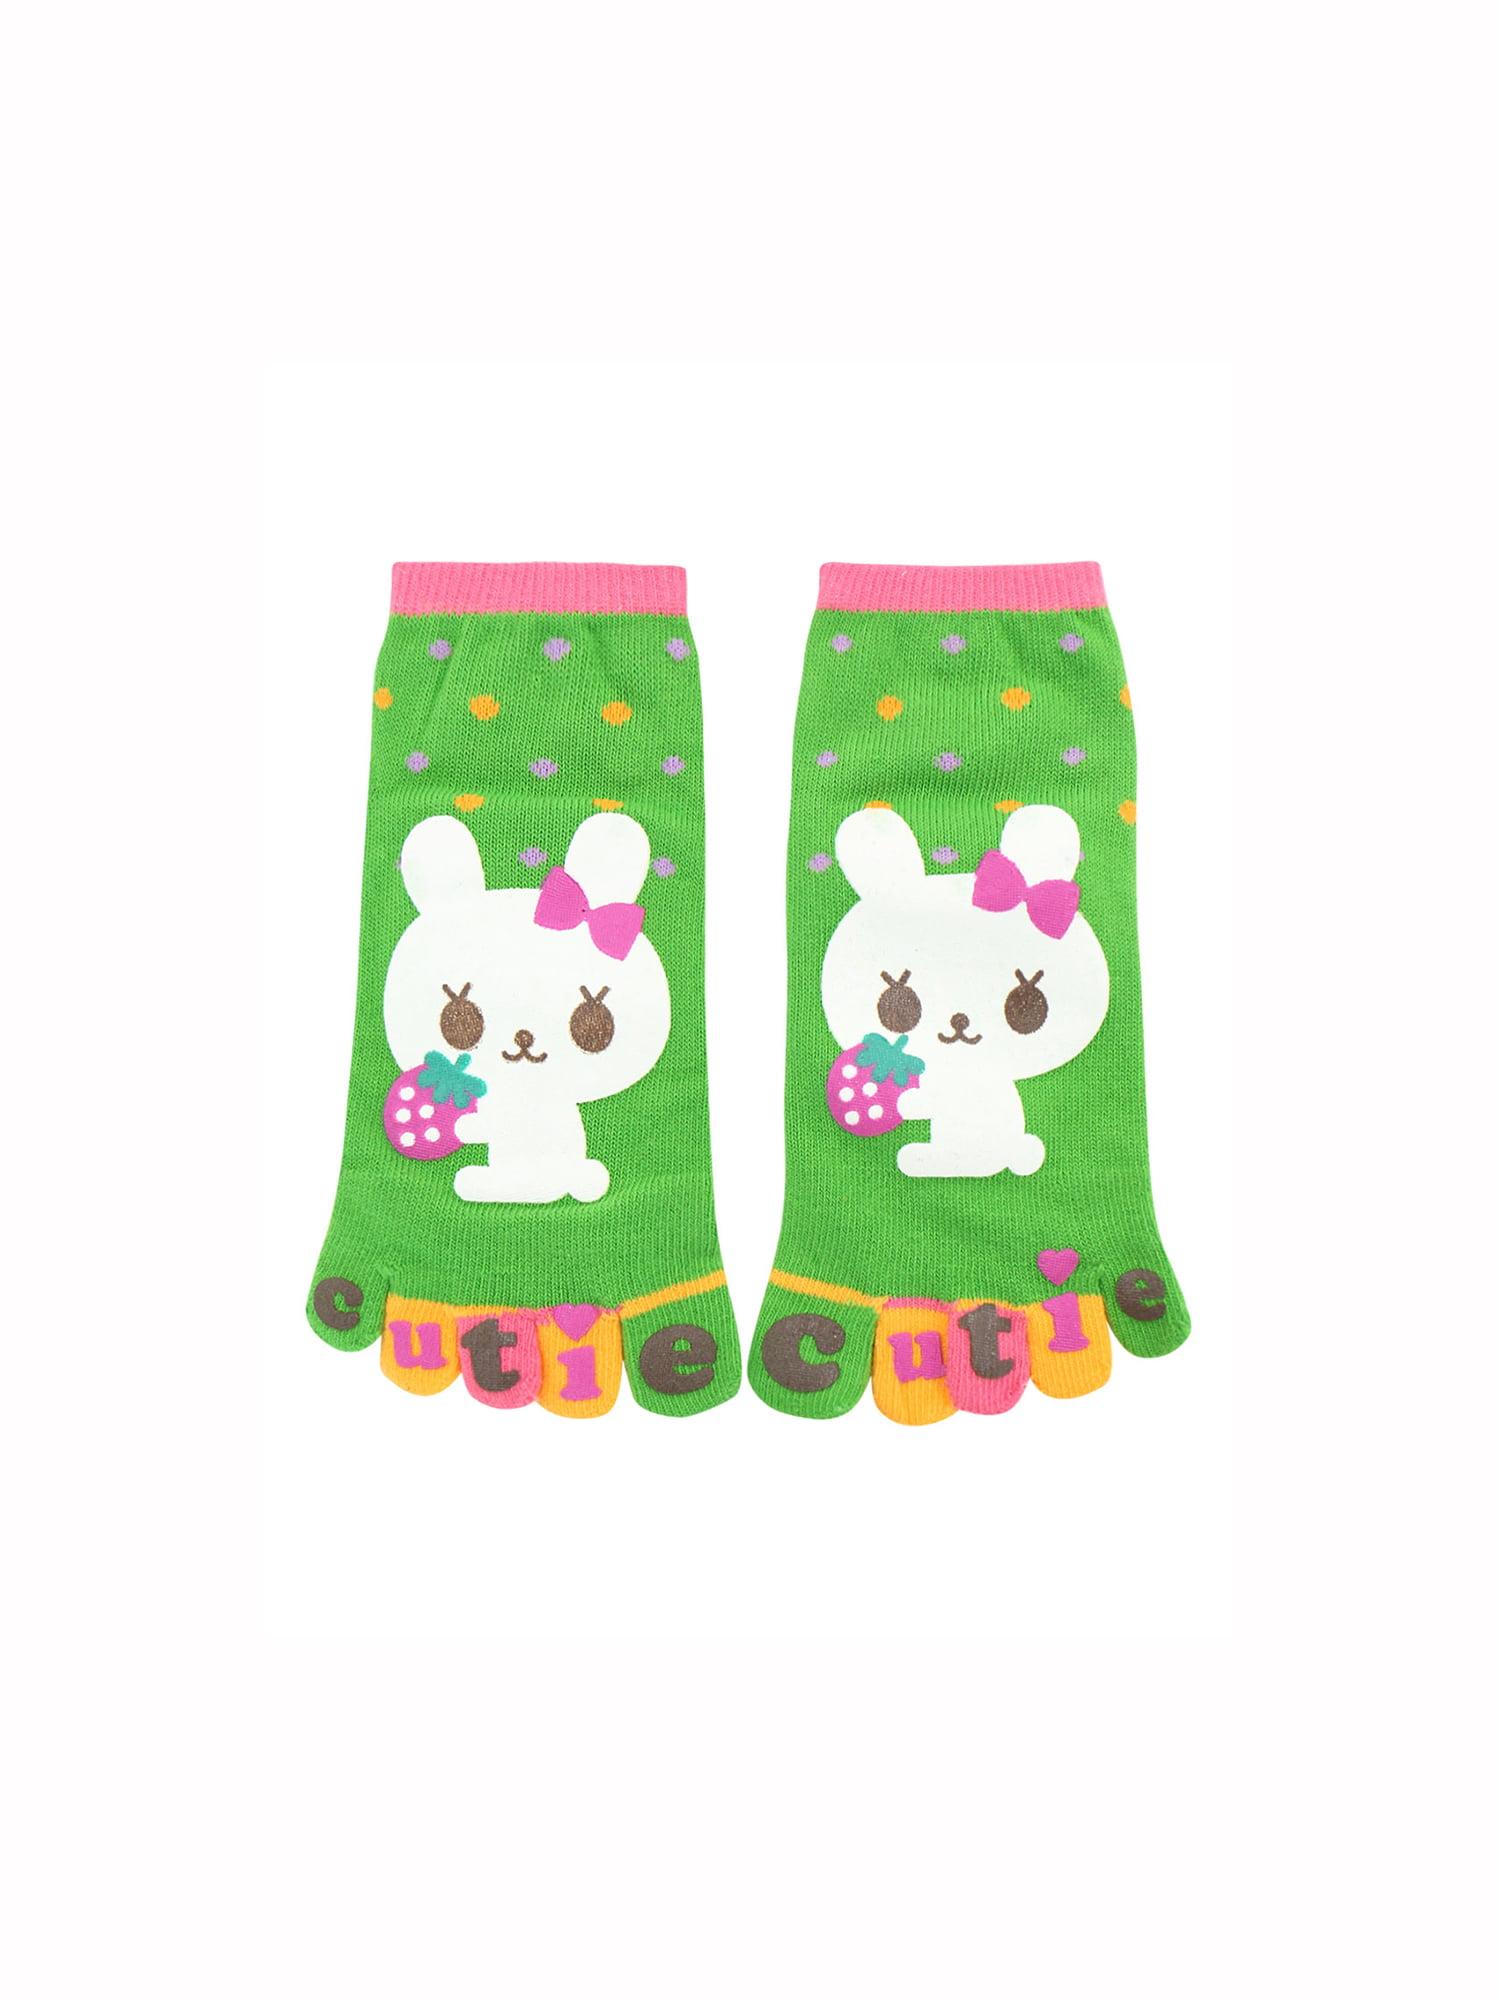 Saint Patrick Party Unique Bargains Girl's Rabbit Letters Print Ankle Length Stretchy Toe Socks Green (Size 8-9.5)